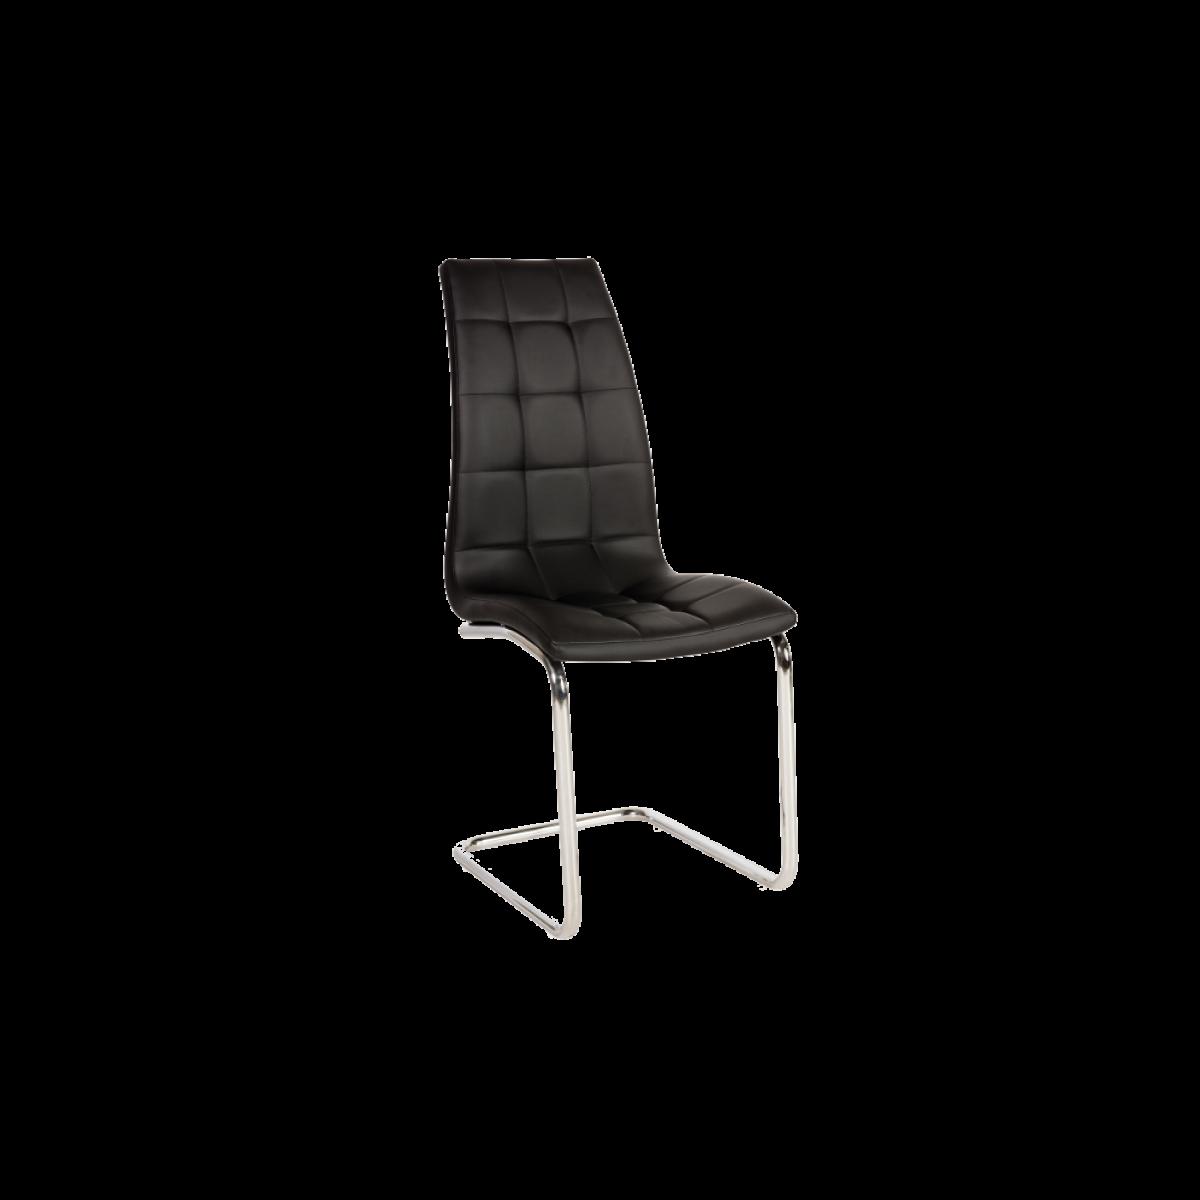 Ac-Deco Chaise en cuir PU - H103 - 43 x 42 x 102 cm - Noir